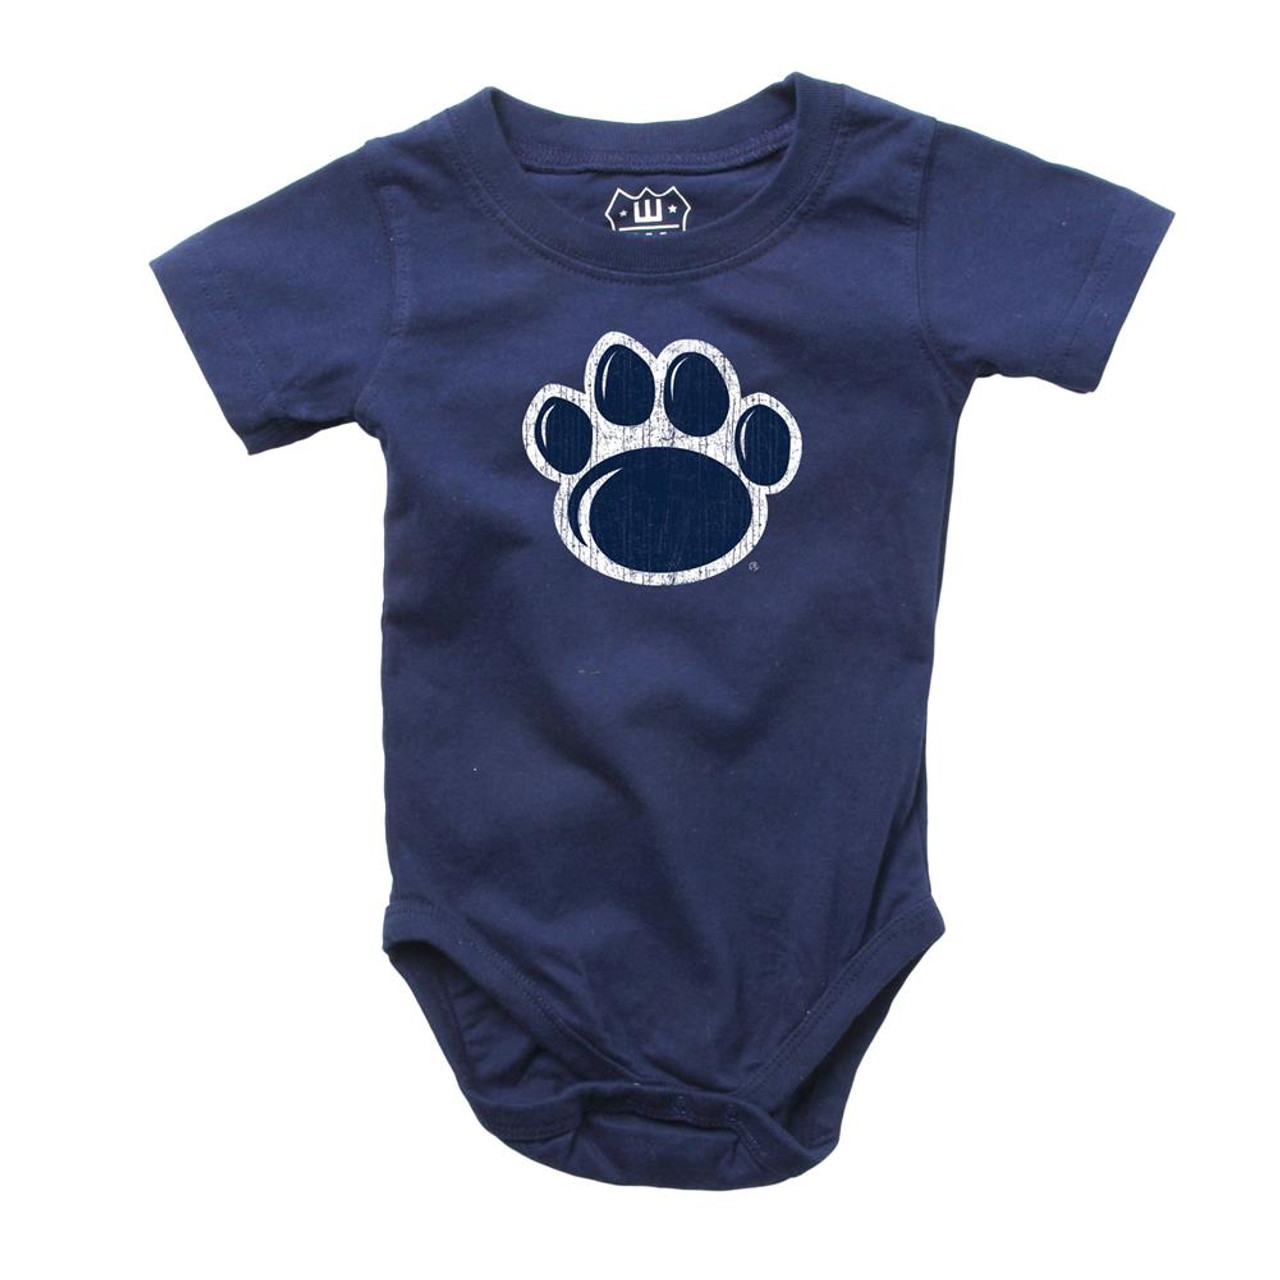 Infant Penn State University Bodysuits 3 Pack Organic Cotton Set